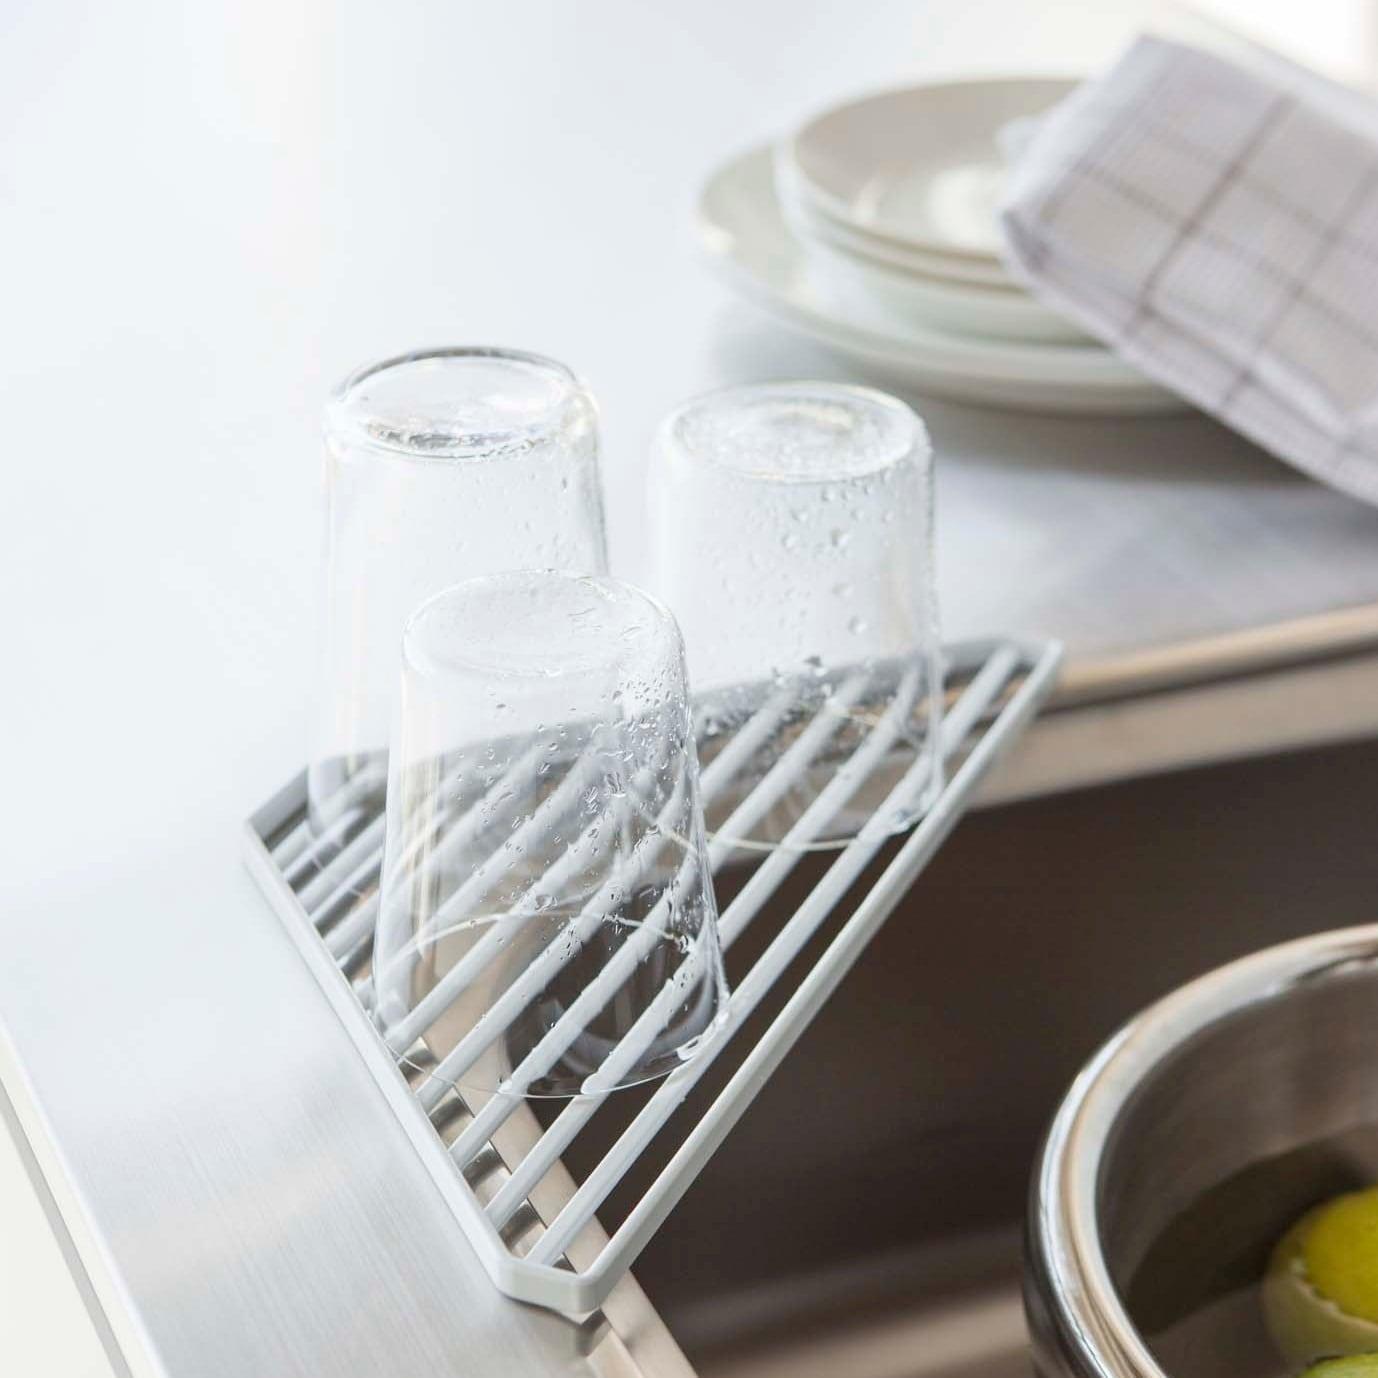 Yamazaki USA Corner Sink Shelf   Free Shipping On Orders Over $45    Overstock   23145751